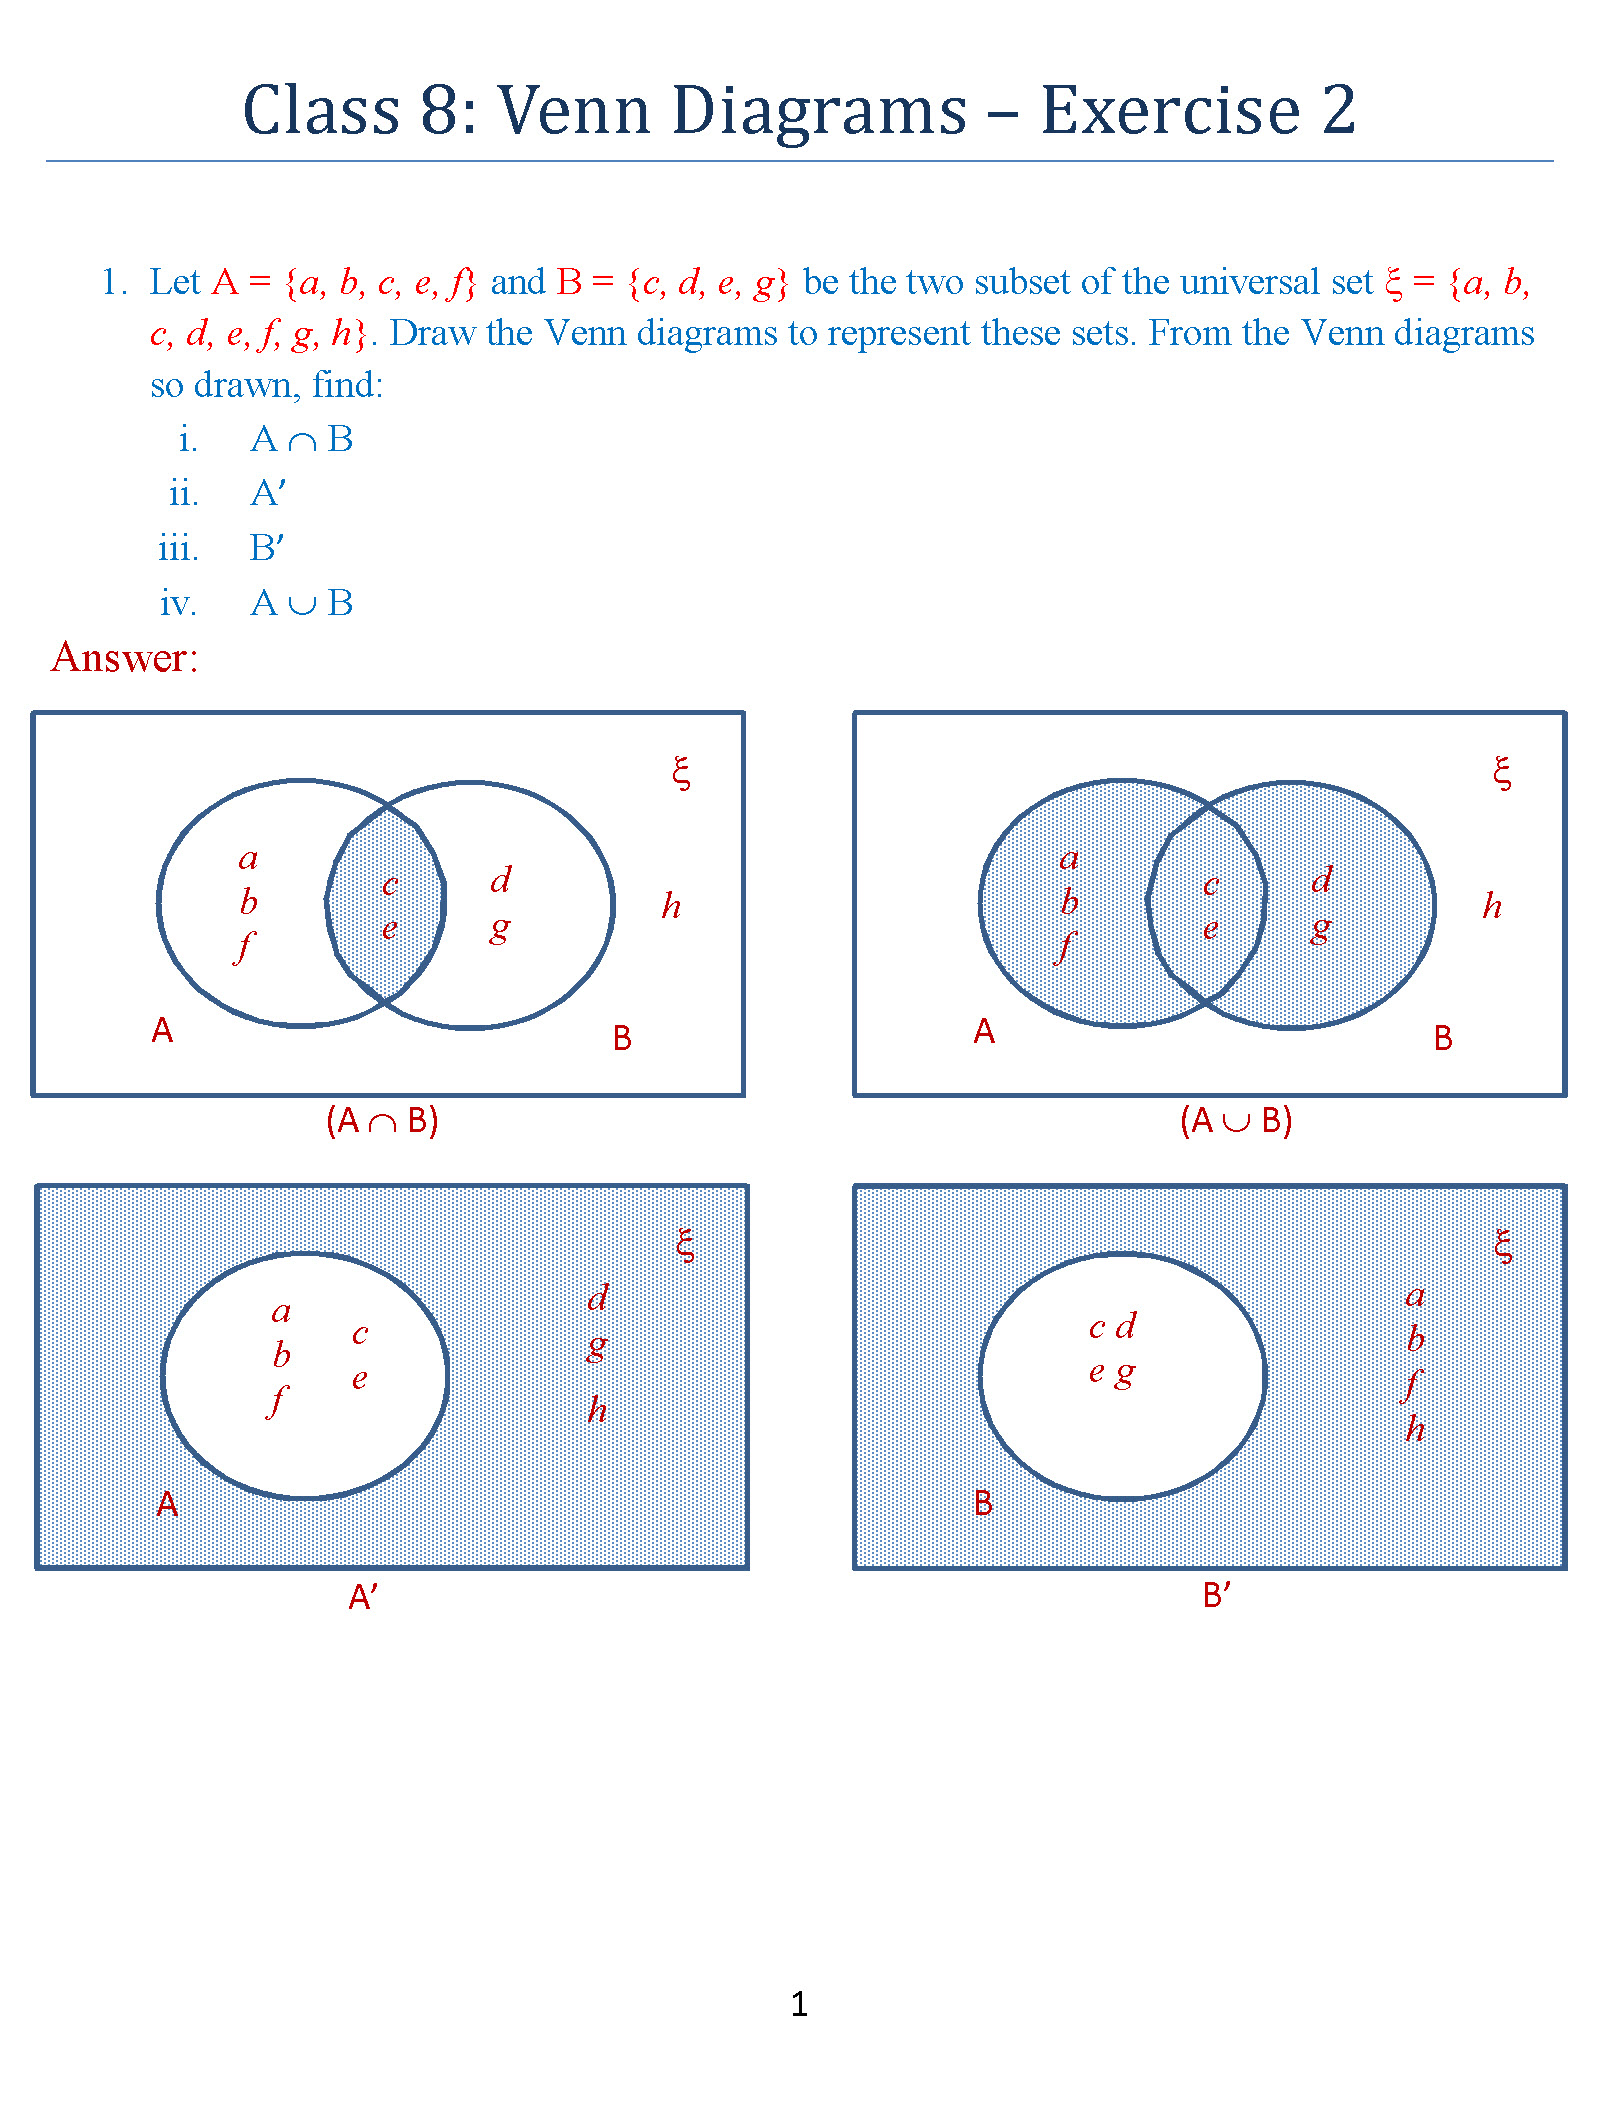 Triple venn diagram generator images diagram design ideas 3 circle venn diagram maker layout of minutes cycle diagram 3 circle venn diagram generator images pooptronica Gallery